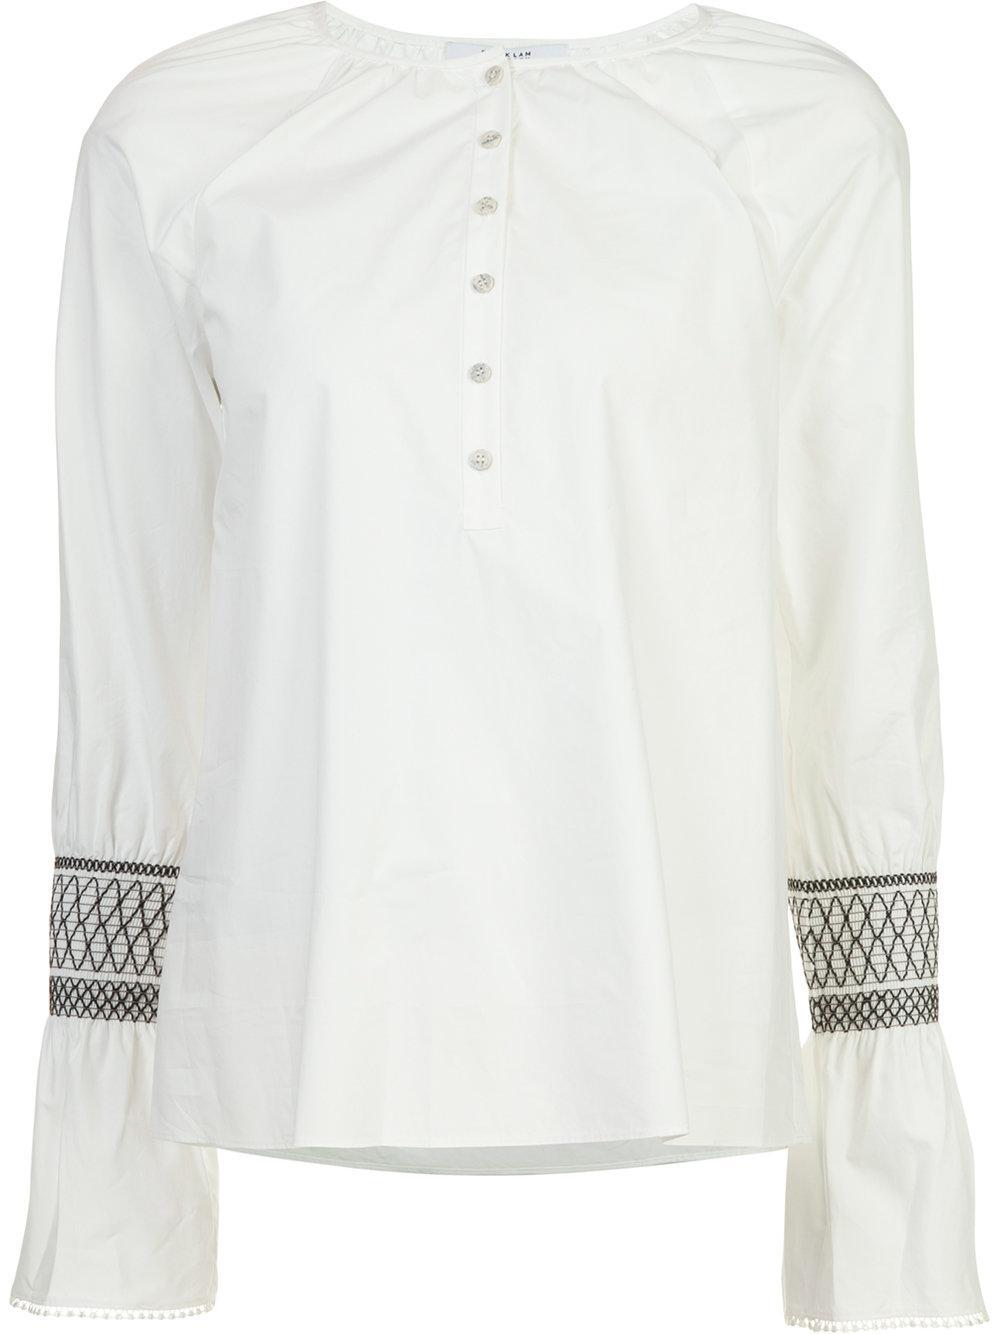 Crosby derek lam embroidered flared cuff shirt in white